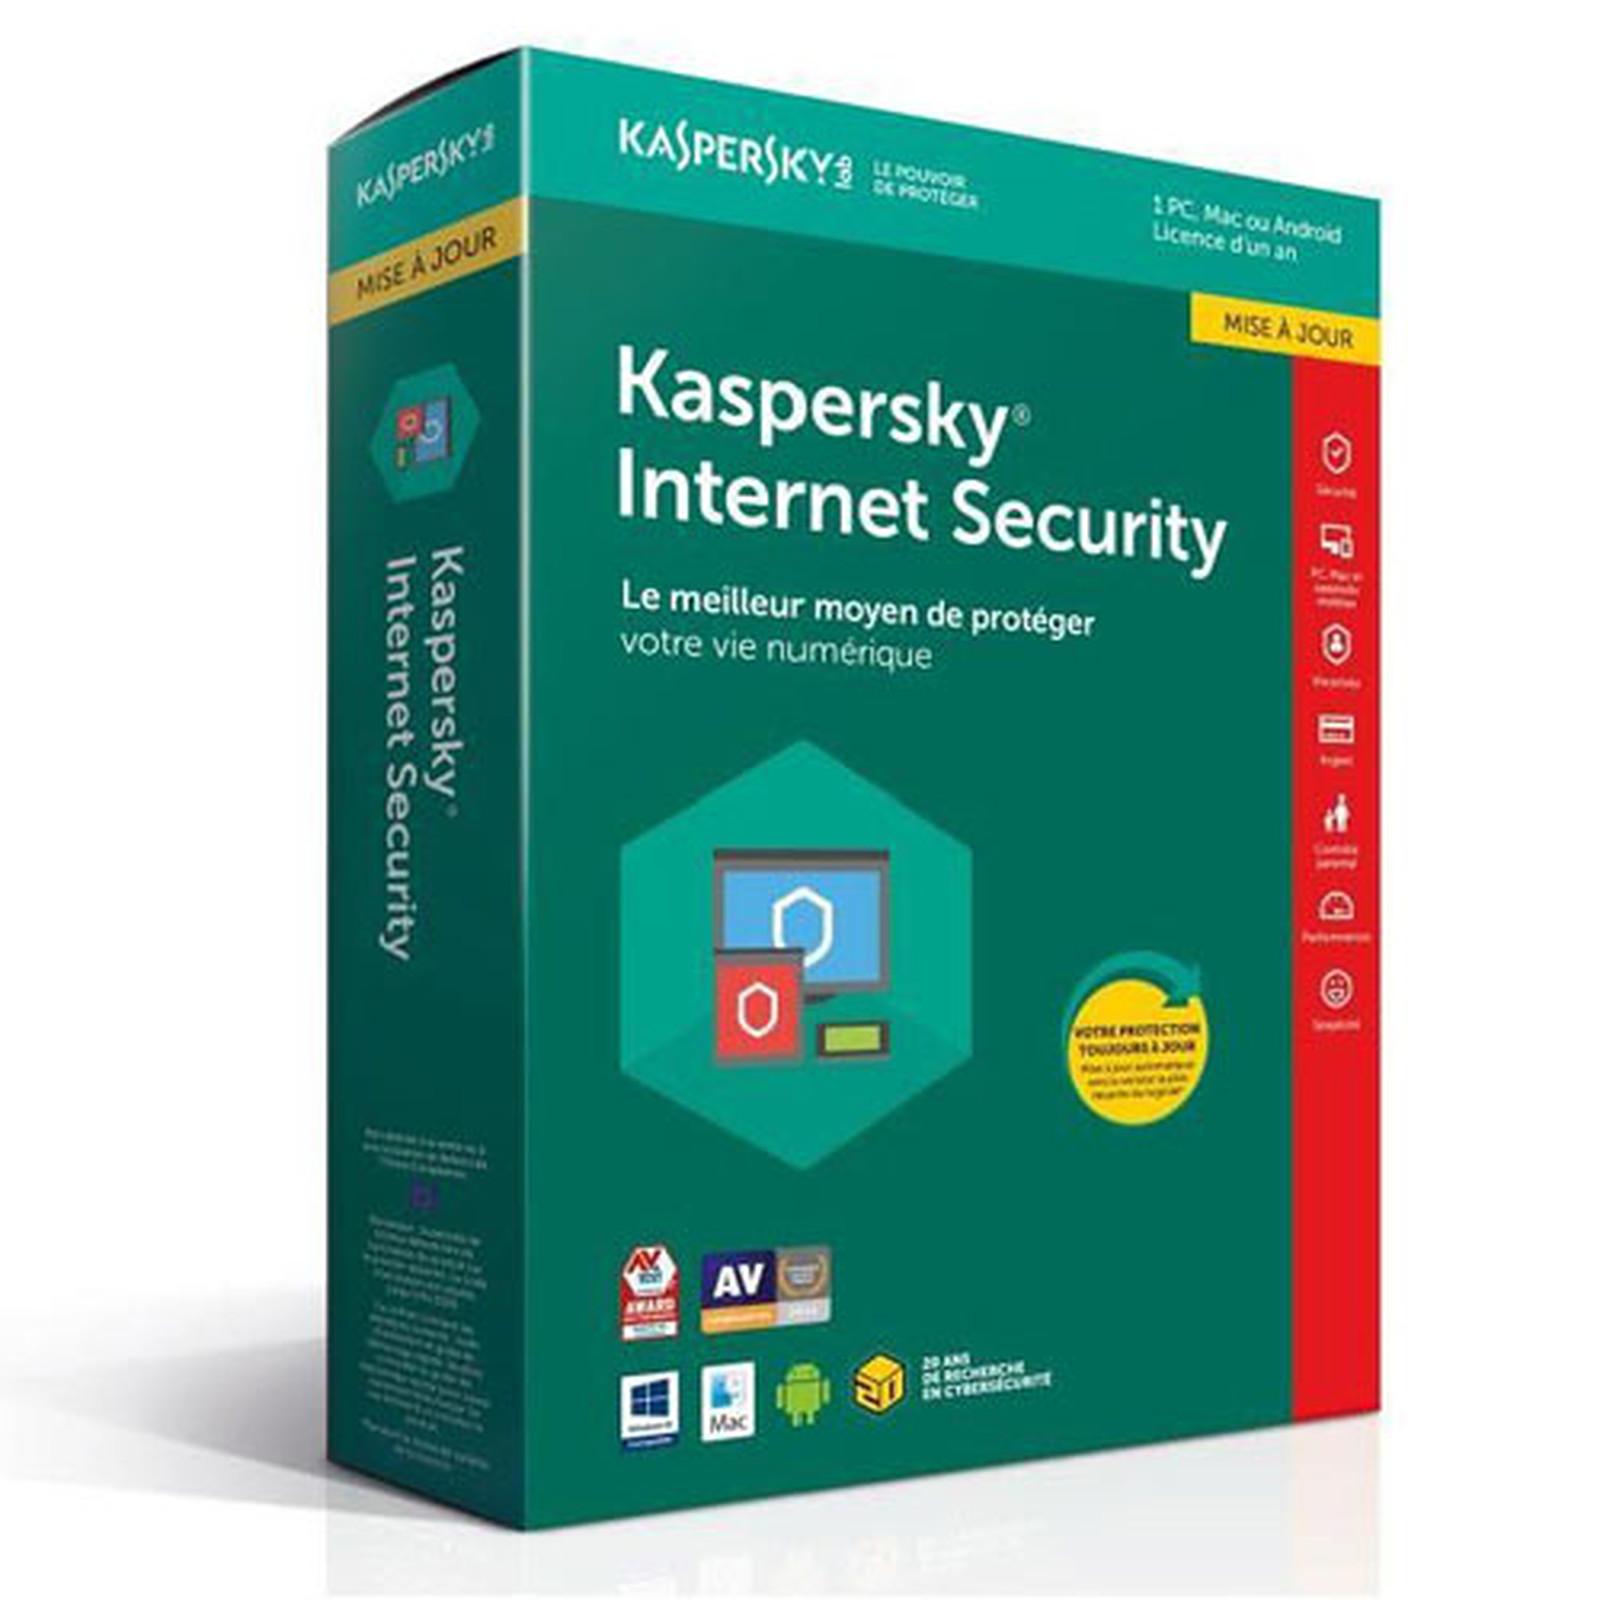 Kaspersky Internet Security 2018 Mise à jour - Licence 1 poste 1 an